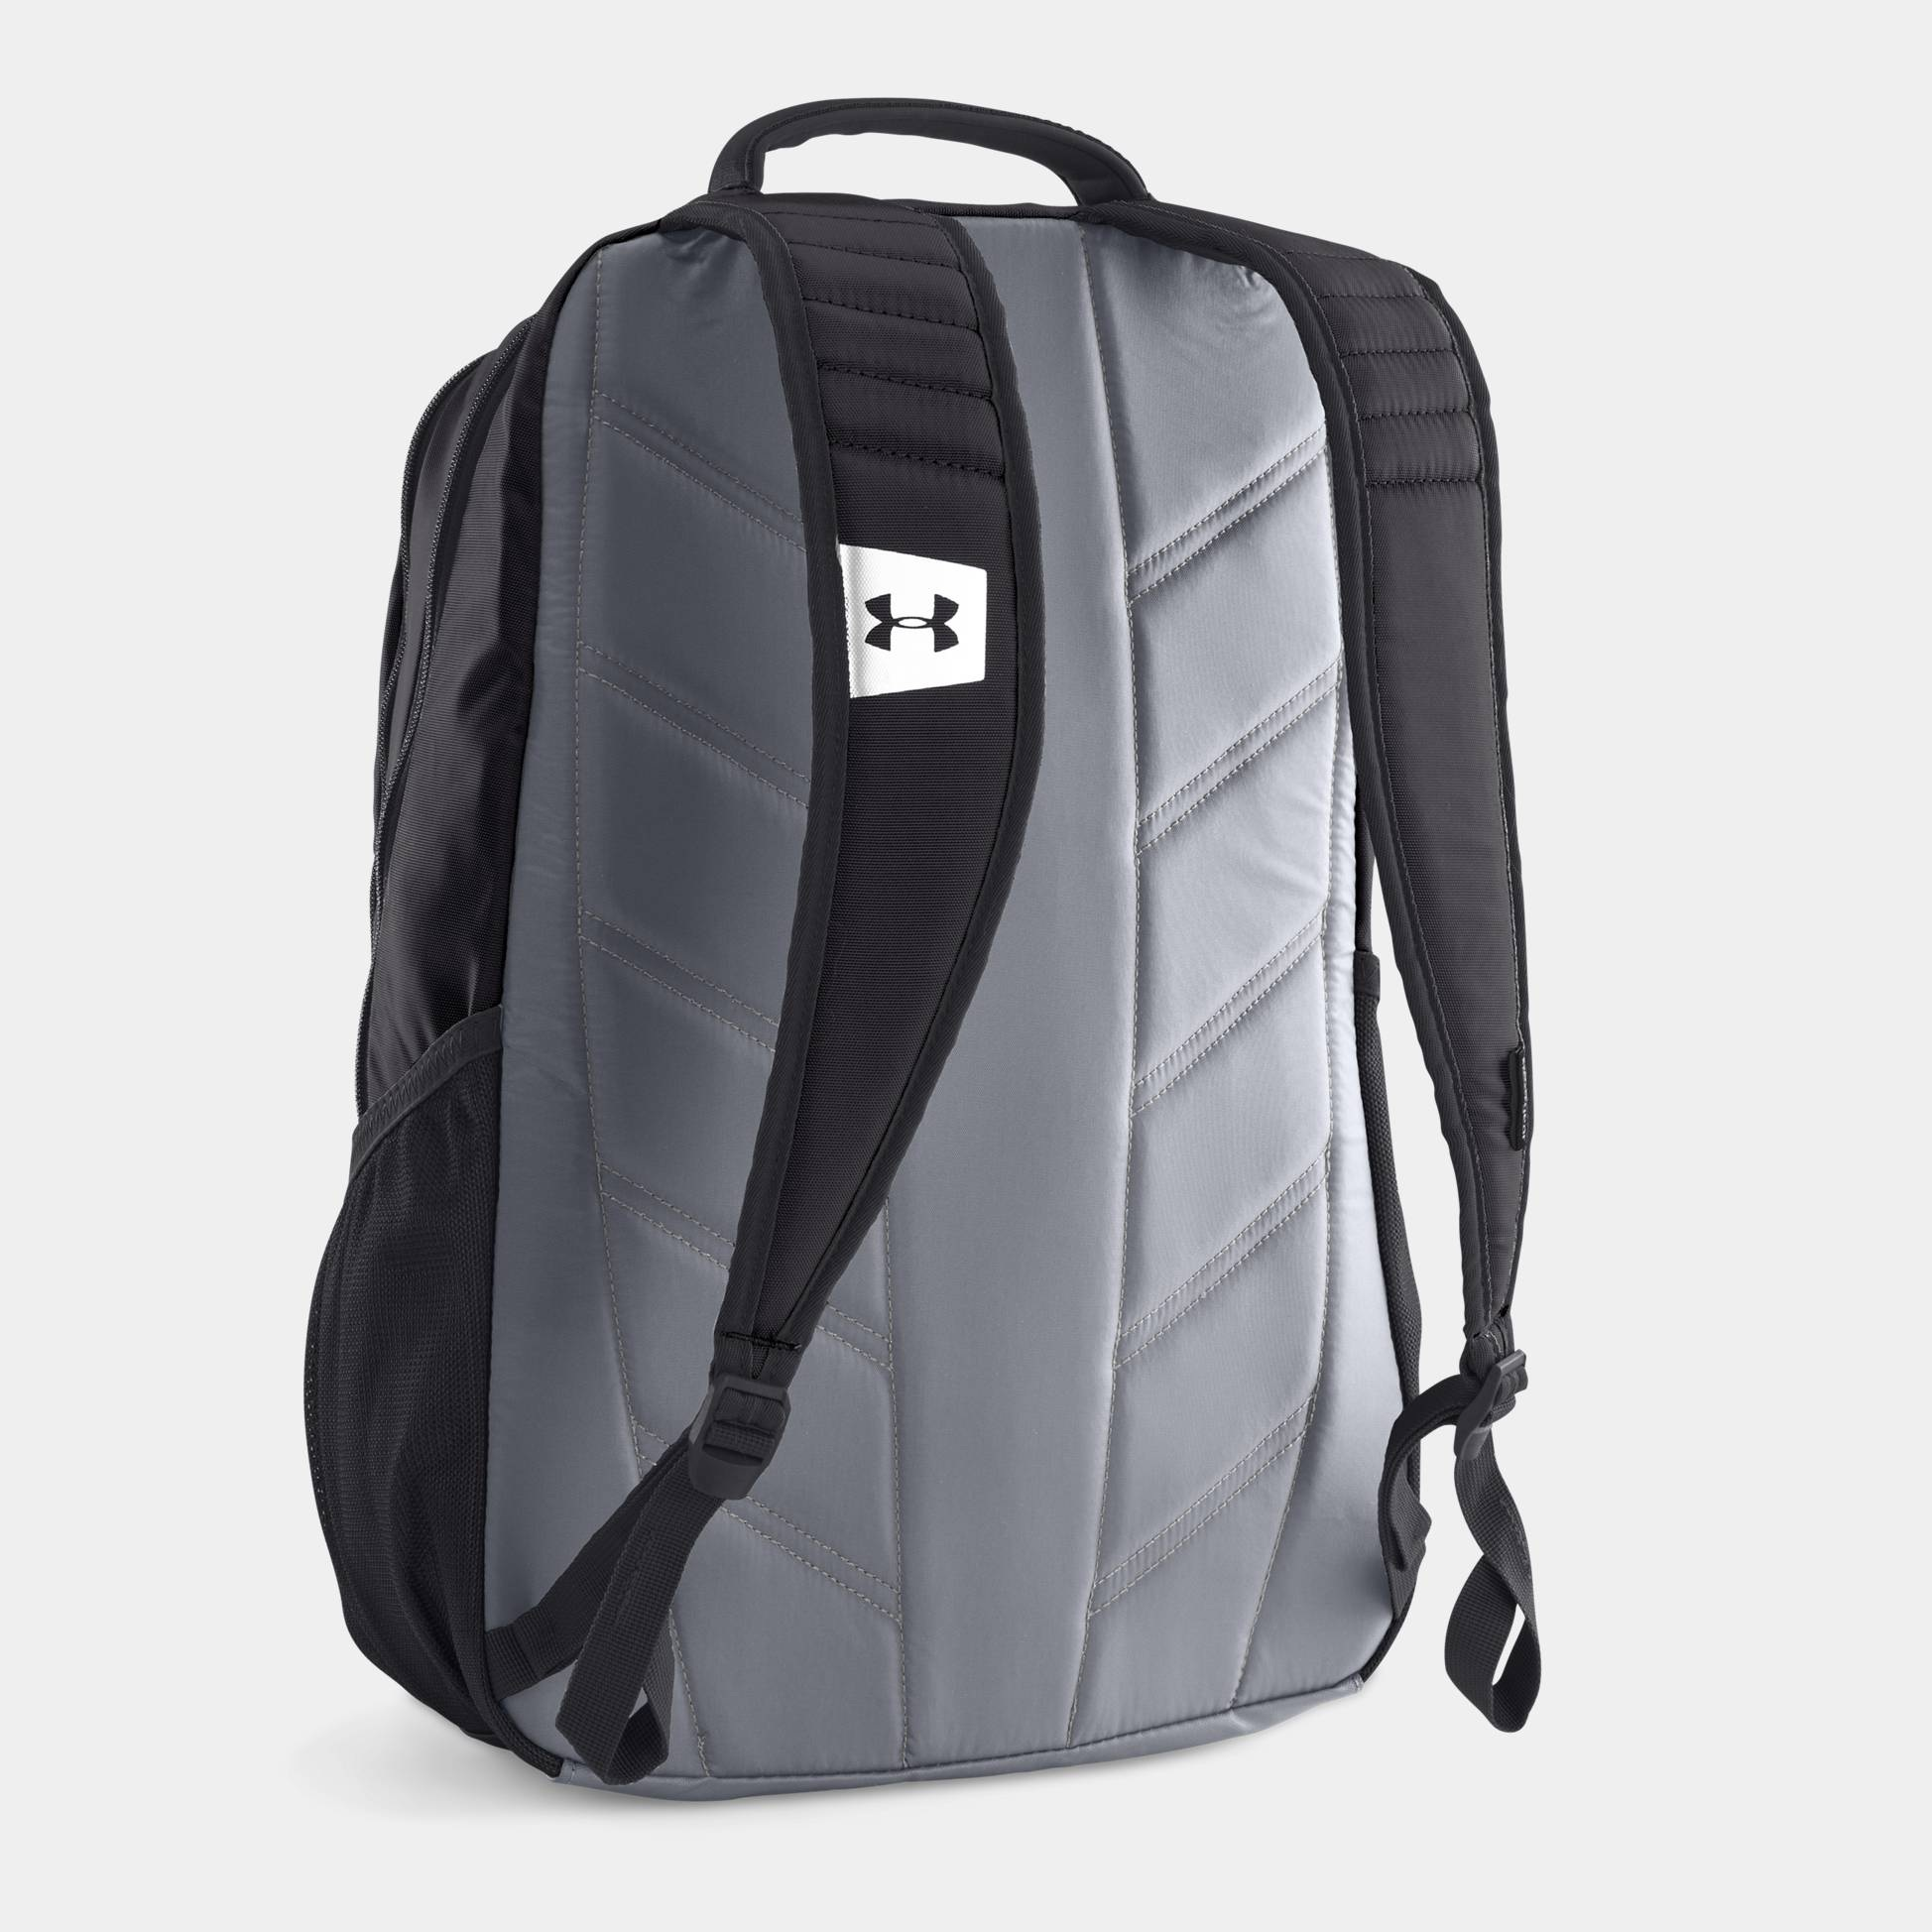 aa7ba8baae Accessories - under armour Storm Hustle II Backpack